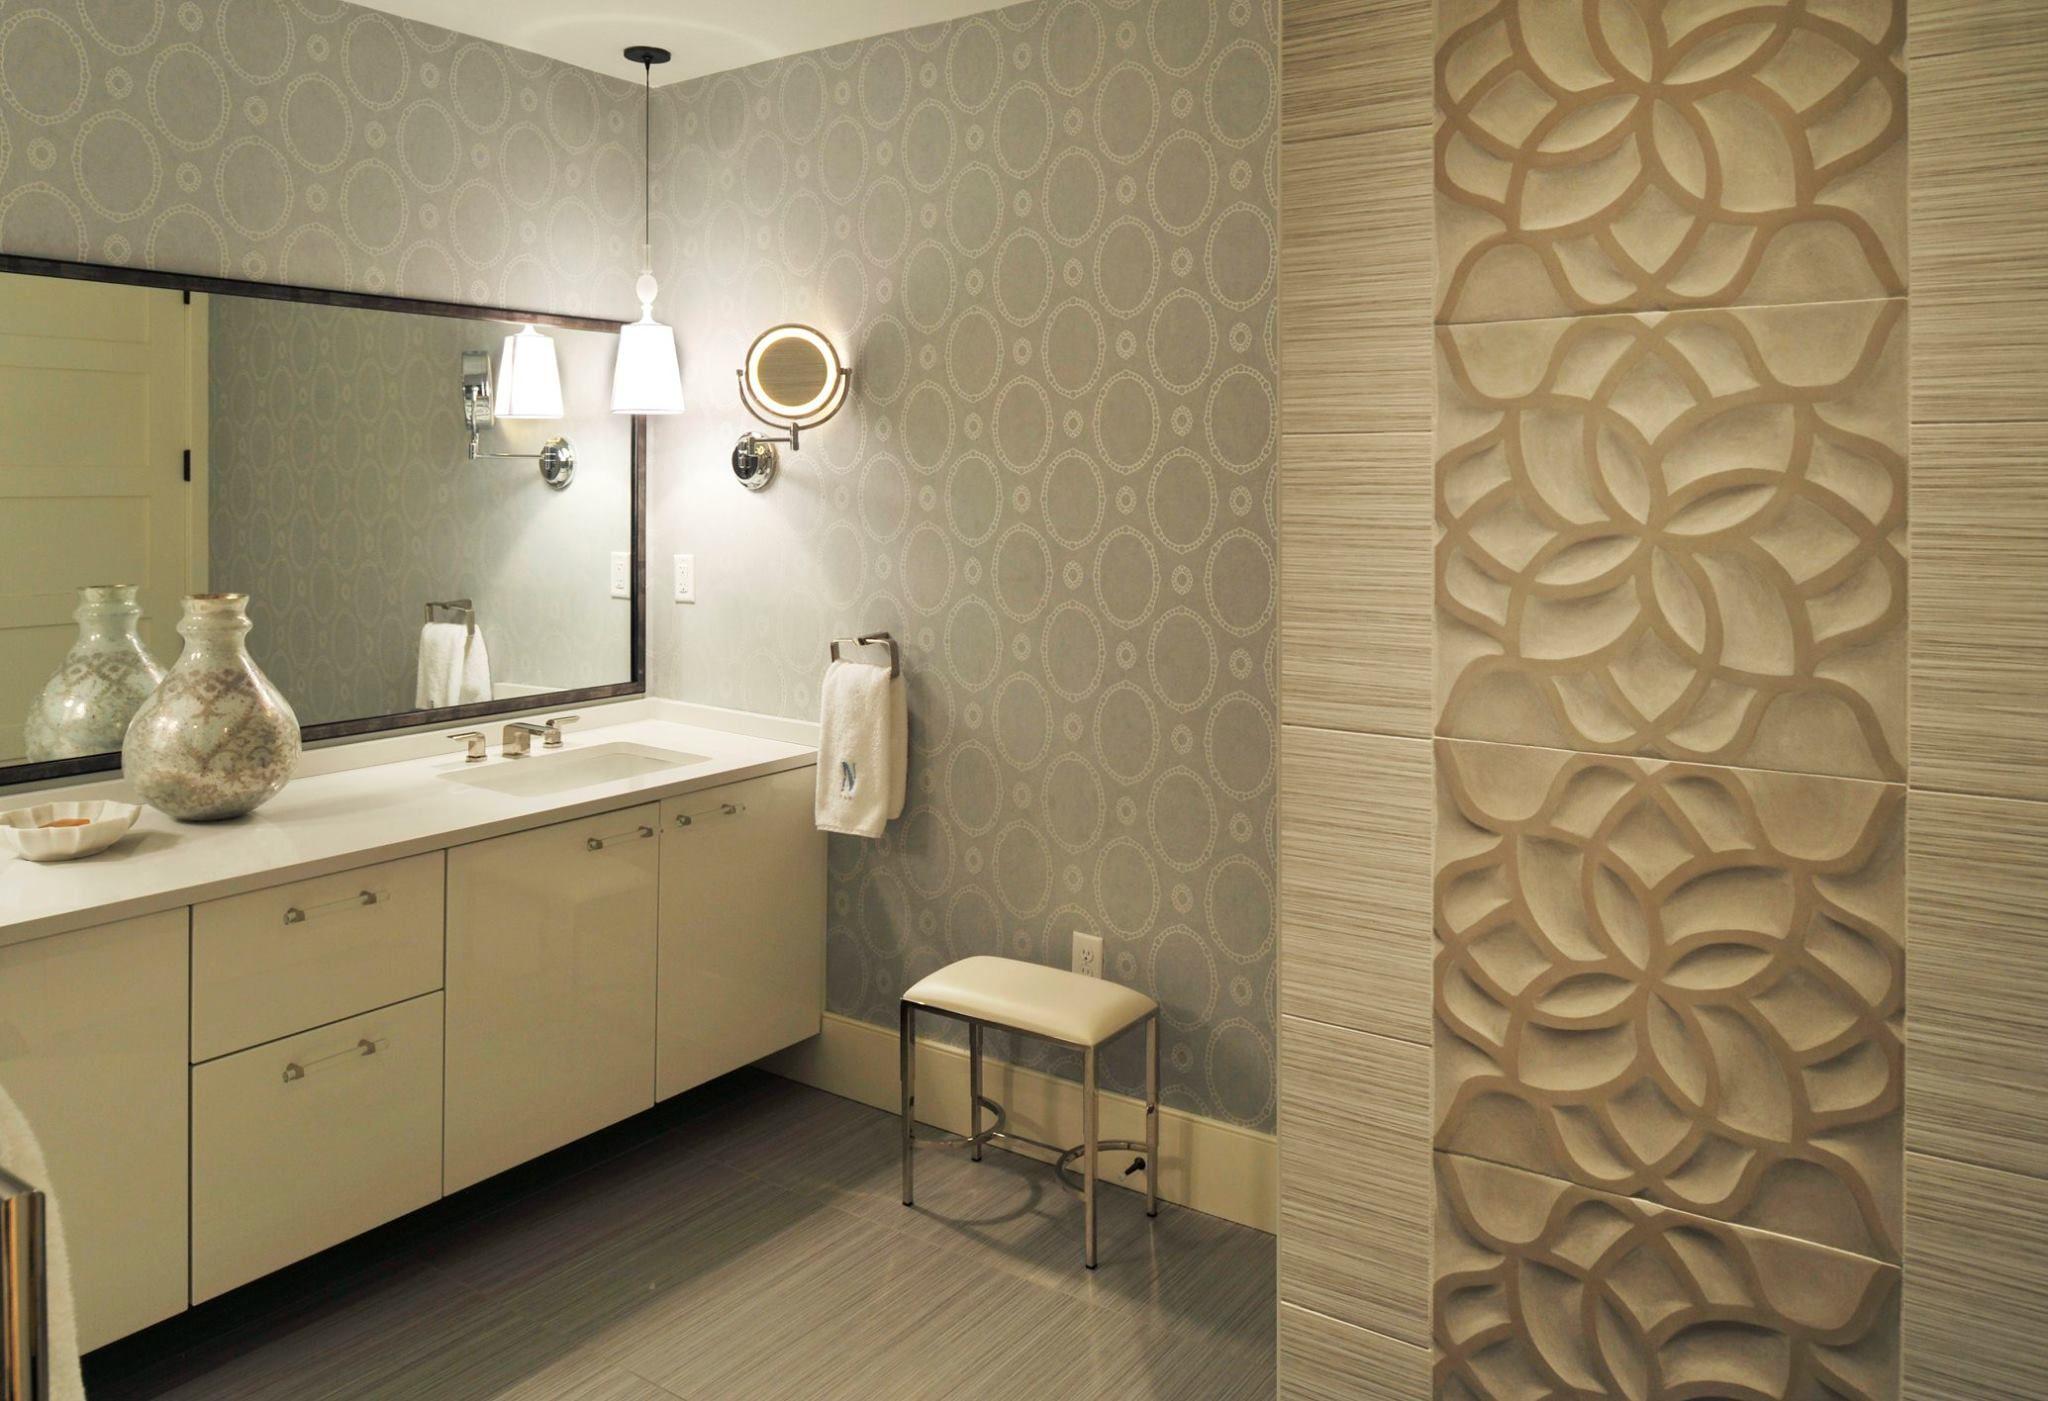 Royalkitchens.co Naples FL | Kitchen design showrooms ...